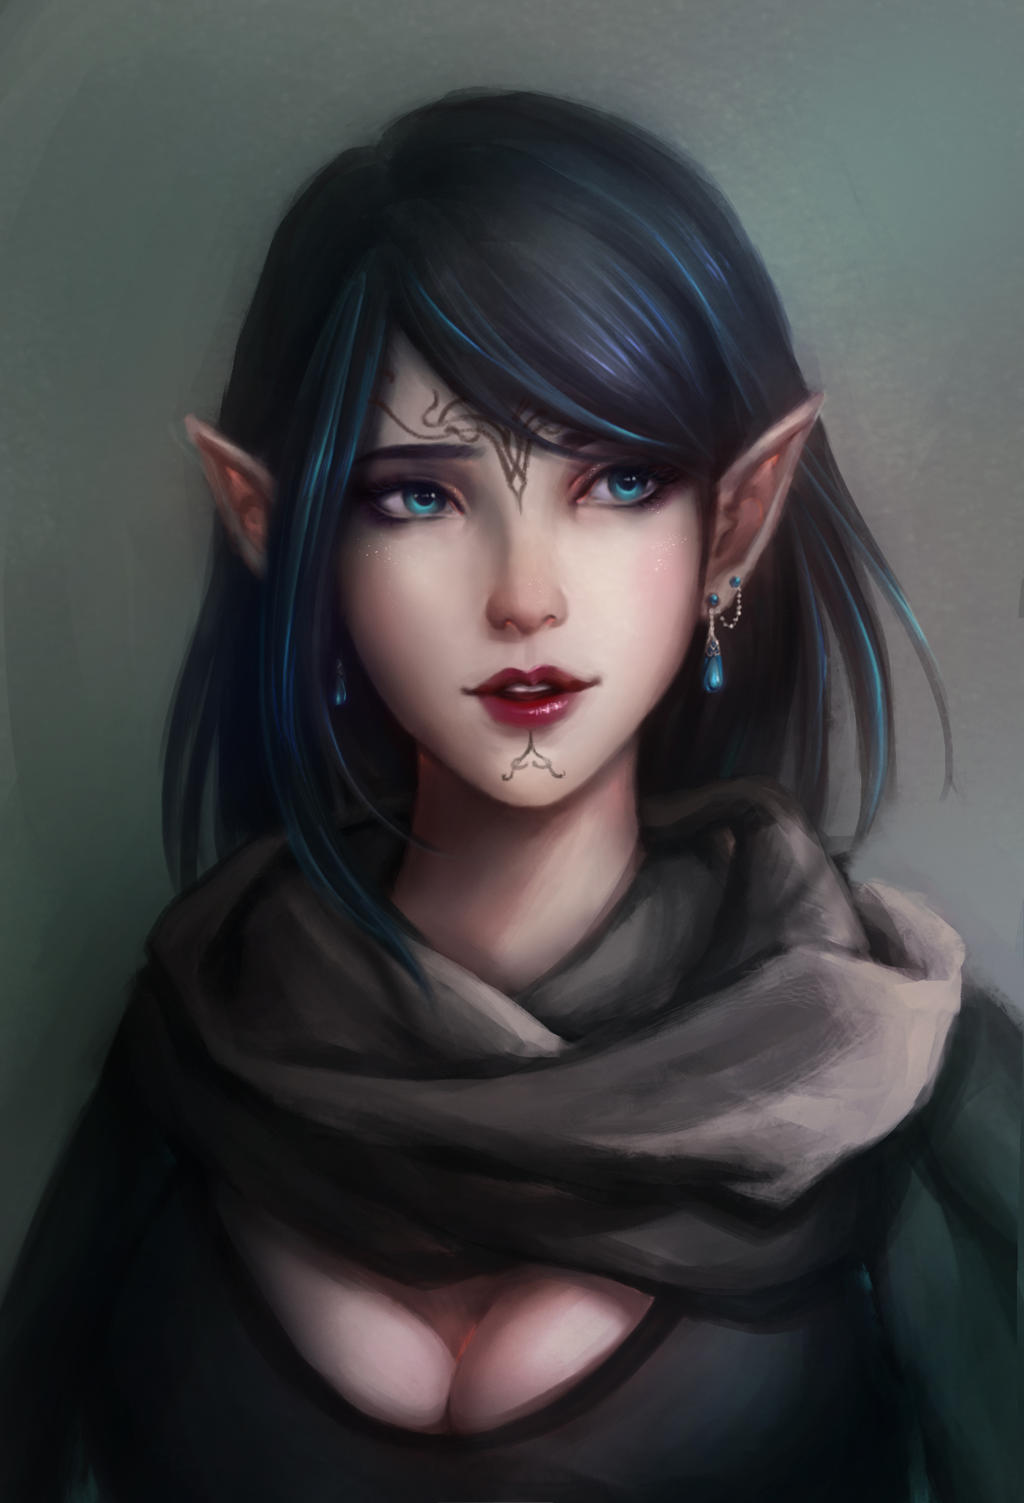 DAI_Inquisitor Lavellan by rieko1910